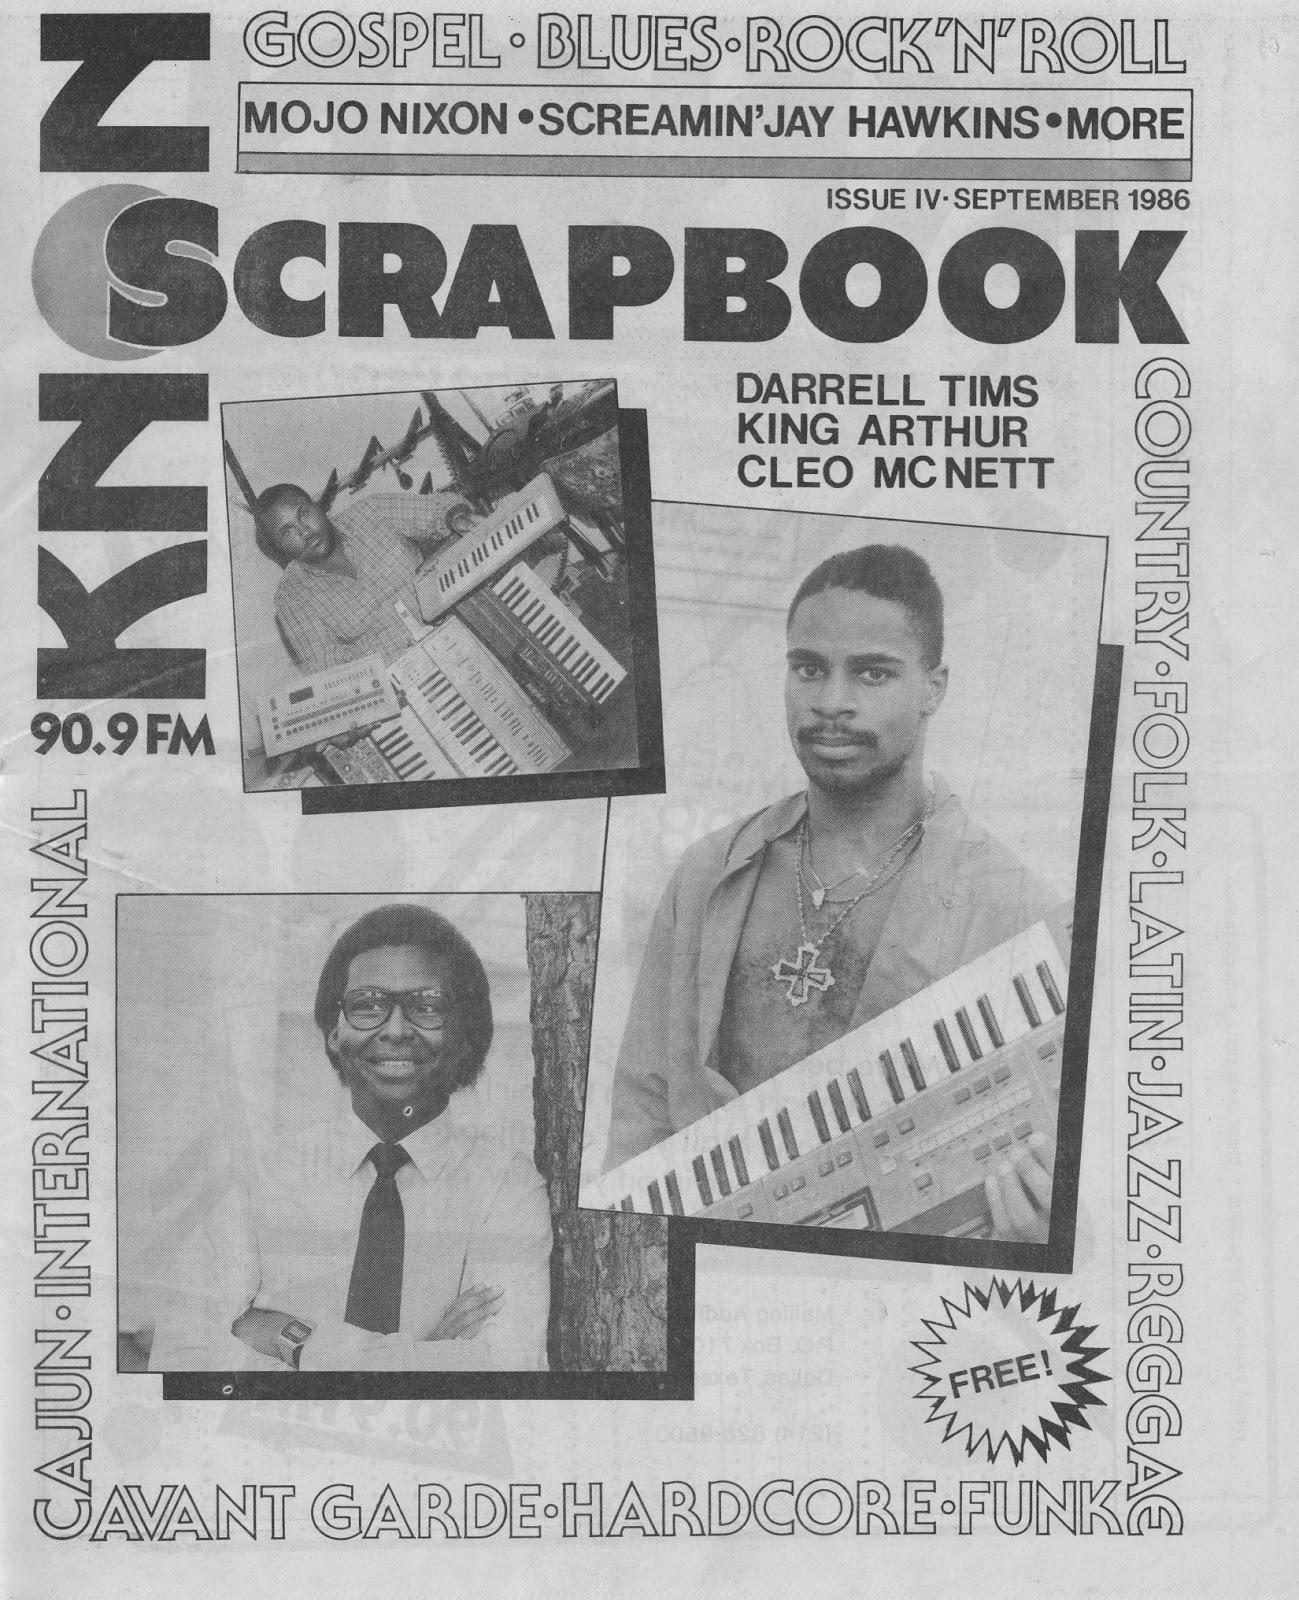 KNON Scrapbook, Volume 4, 1986